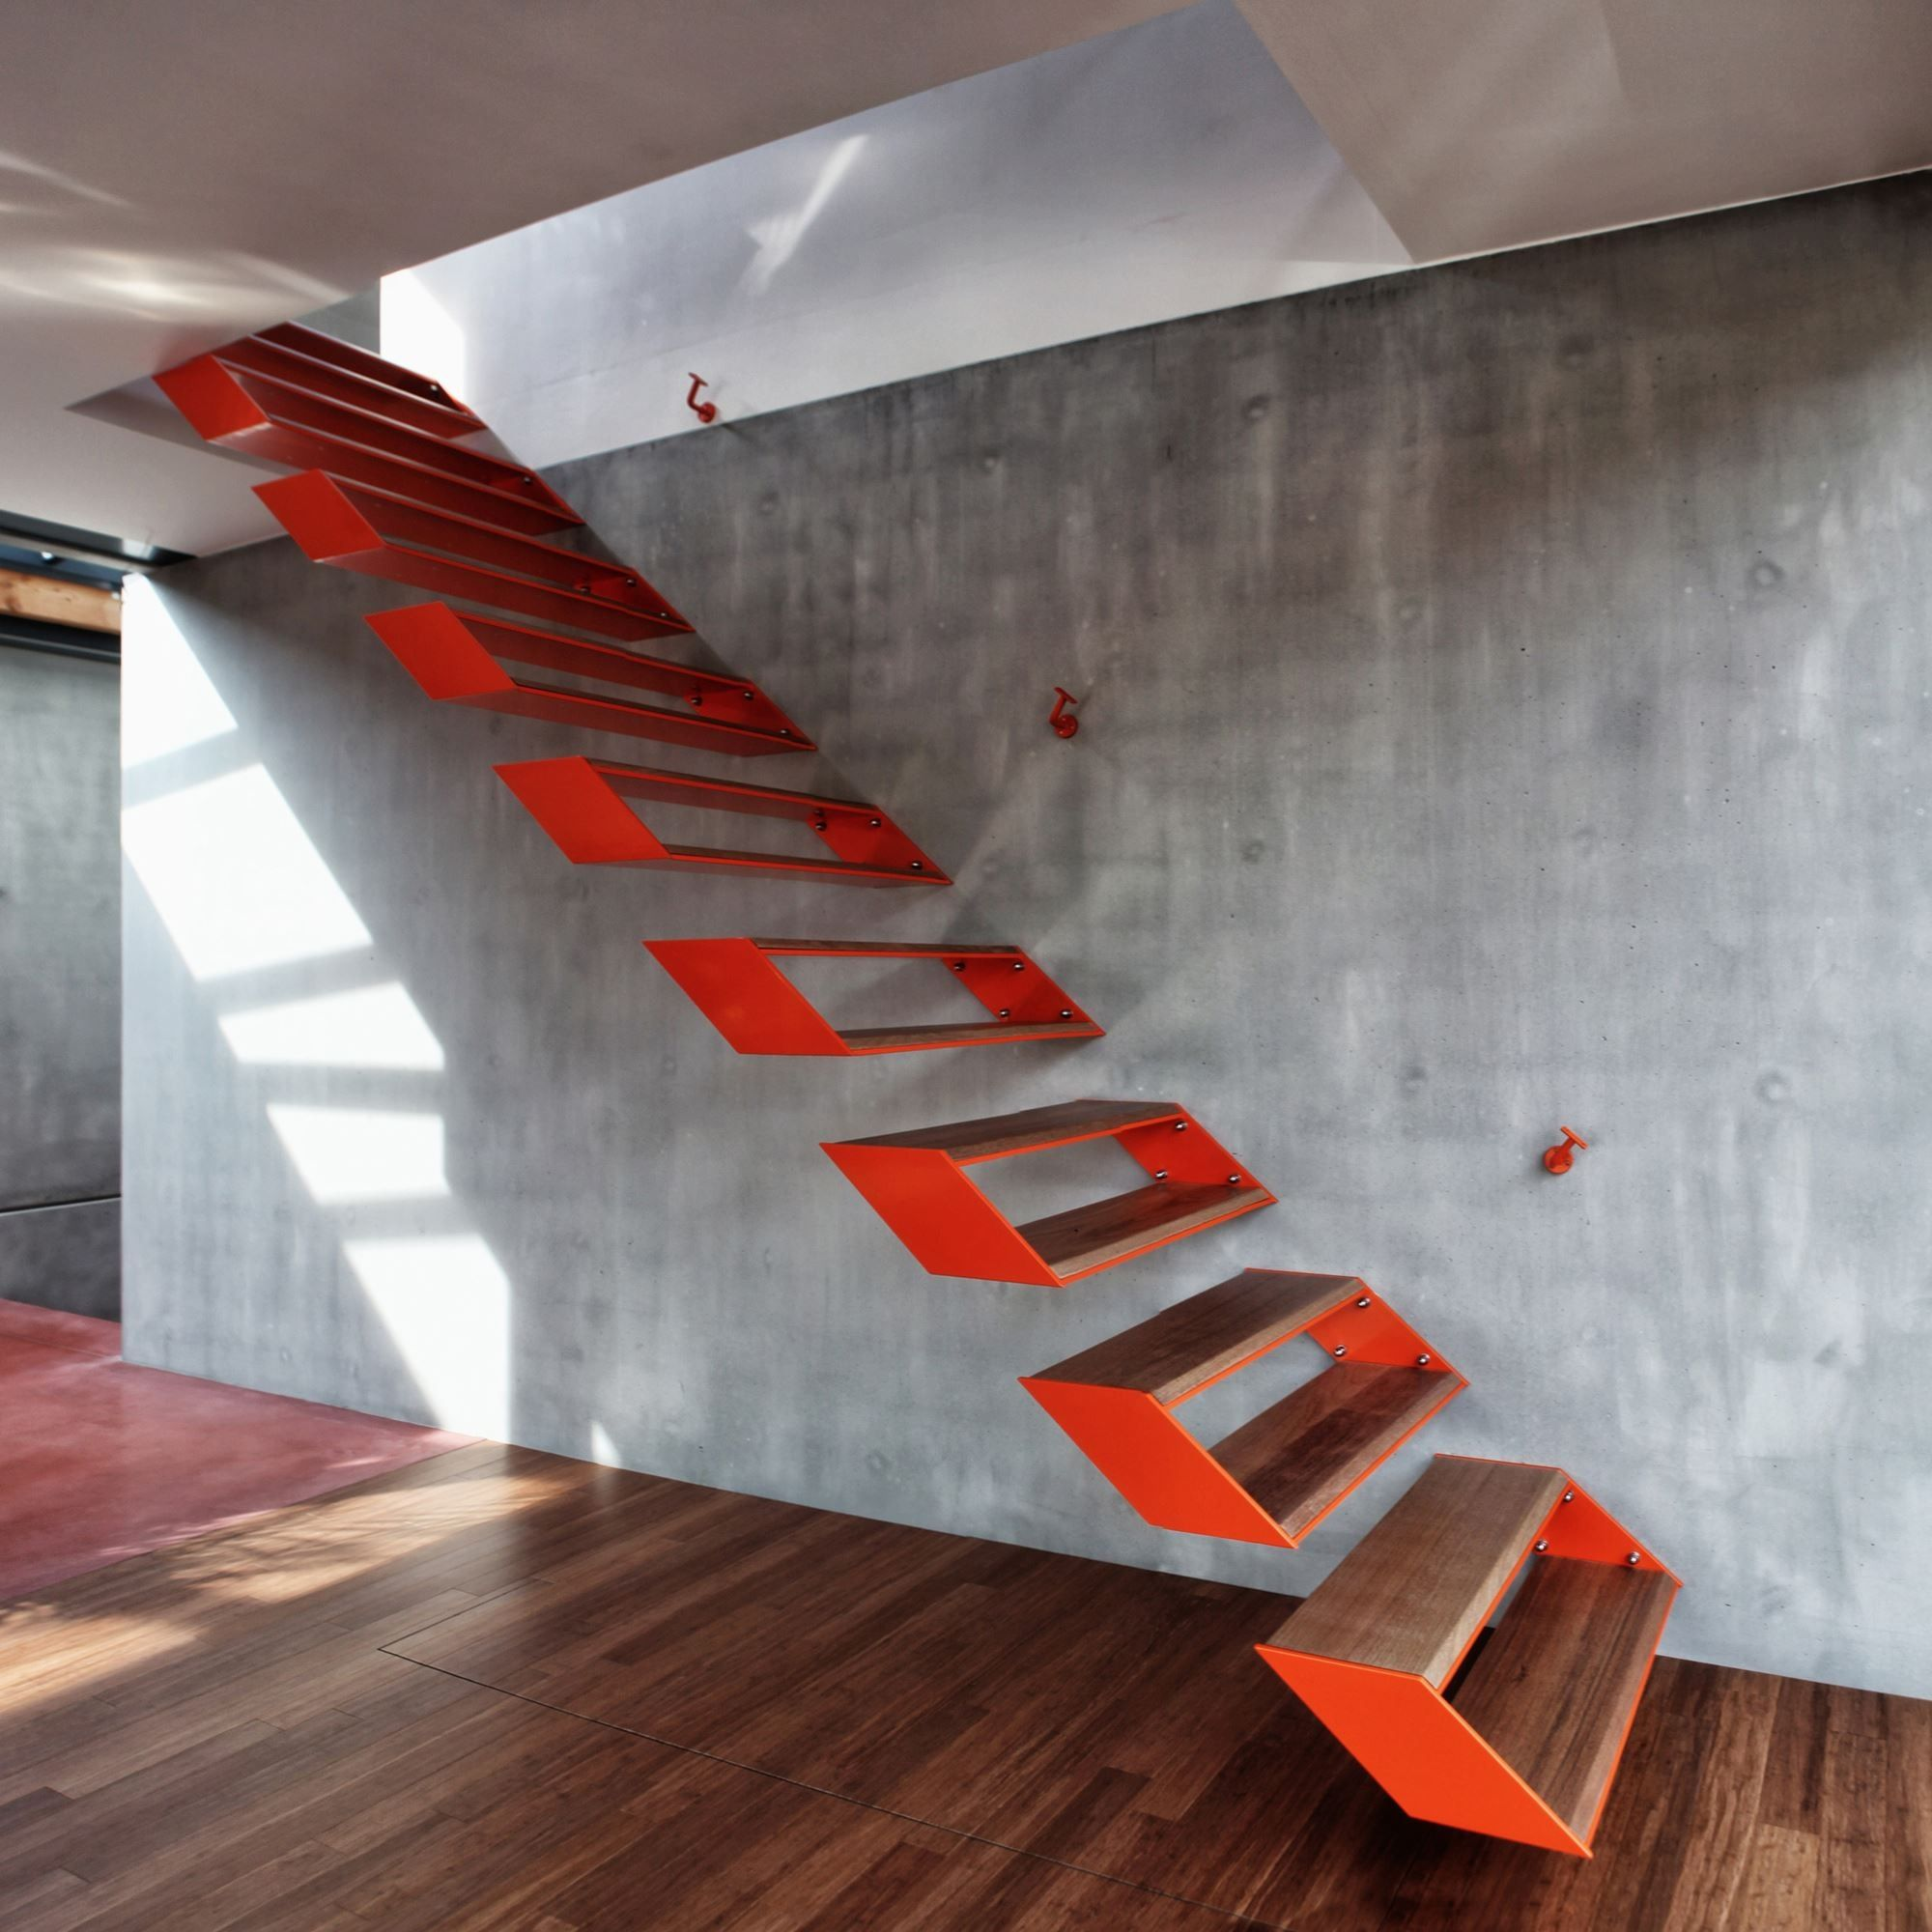 Zaha Hadid Architects Strasbourg And On Pinterest. Shop Interior Design.  Modern House Designs Interior